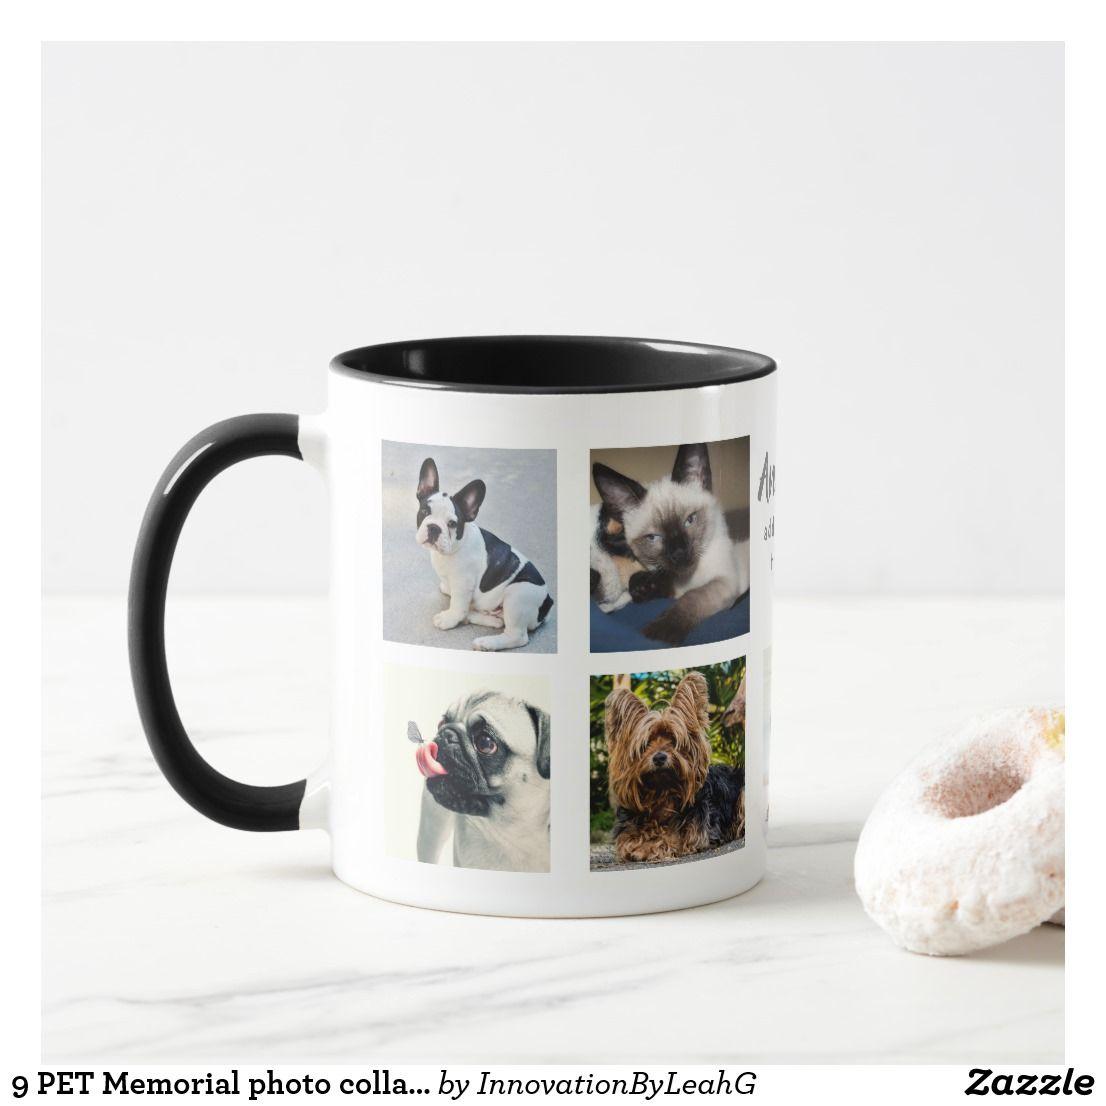 9 pet memorial photo collage instagram name gift mug